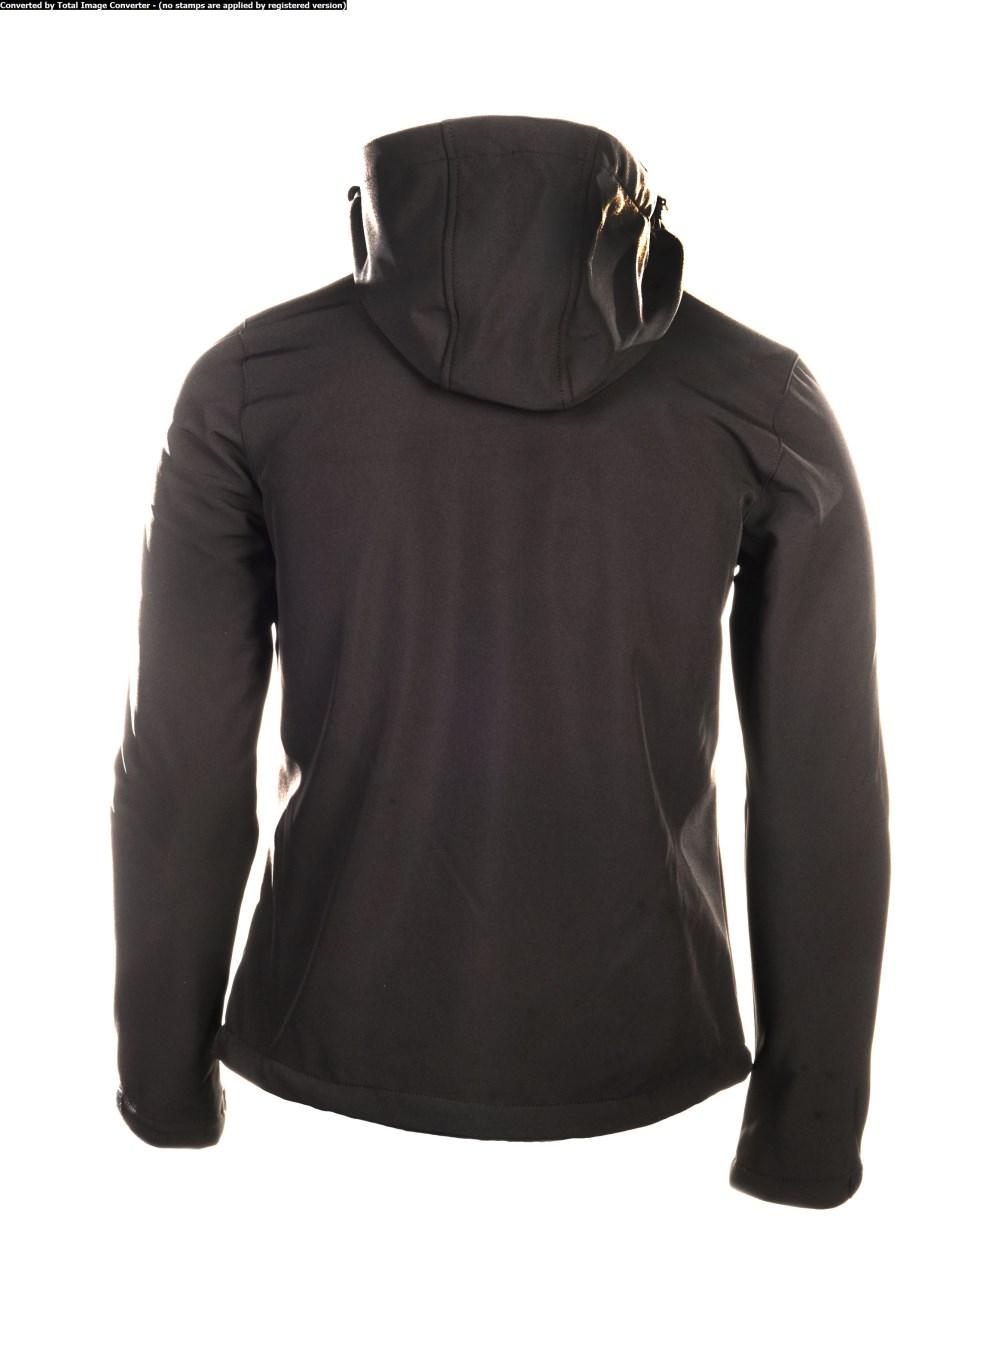 herren softshell spitsbergen golfjacke softshell jacke outdoor black hooded ebay. Black Bedroom Furniture Sets. Home Design Ideas